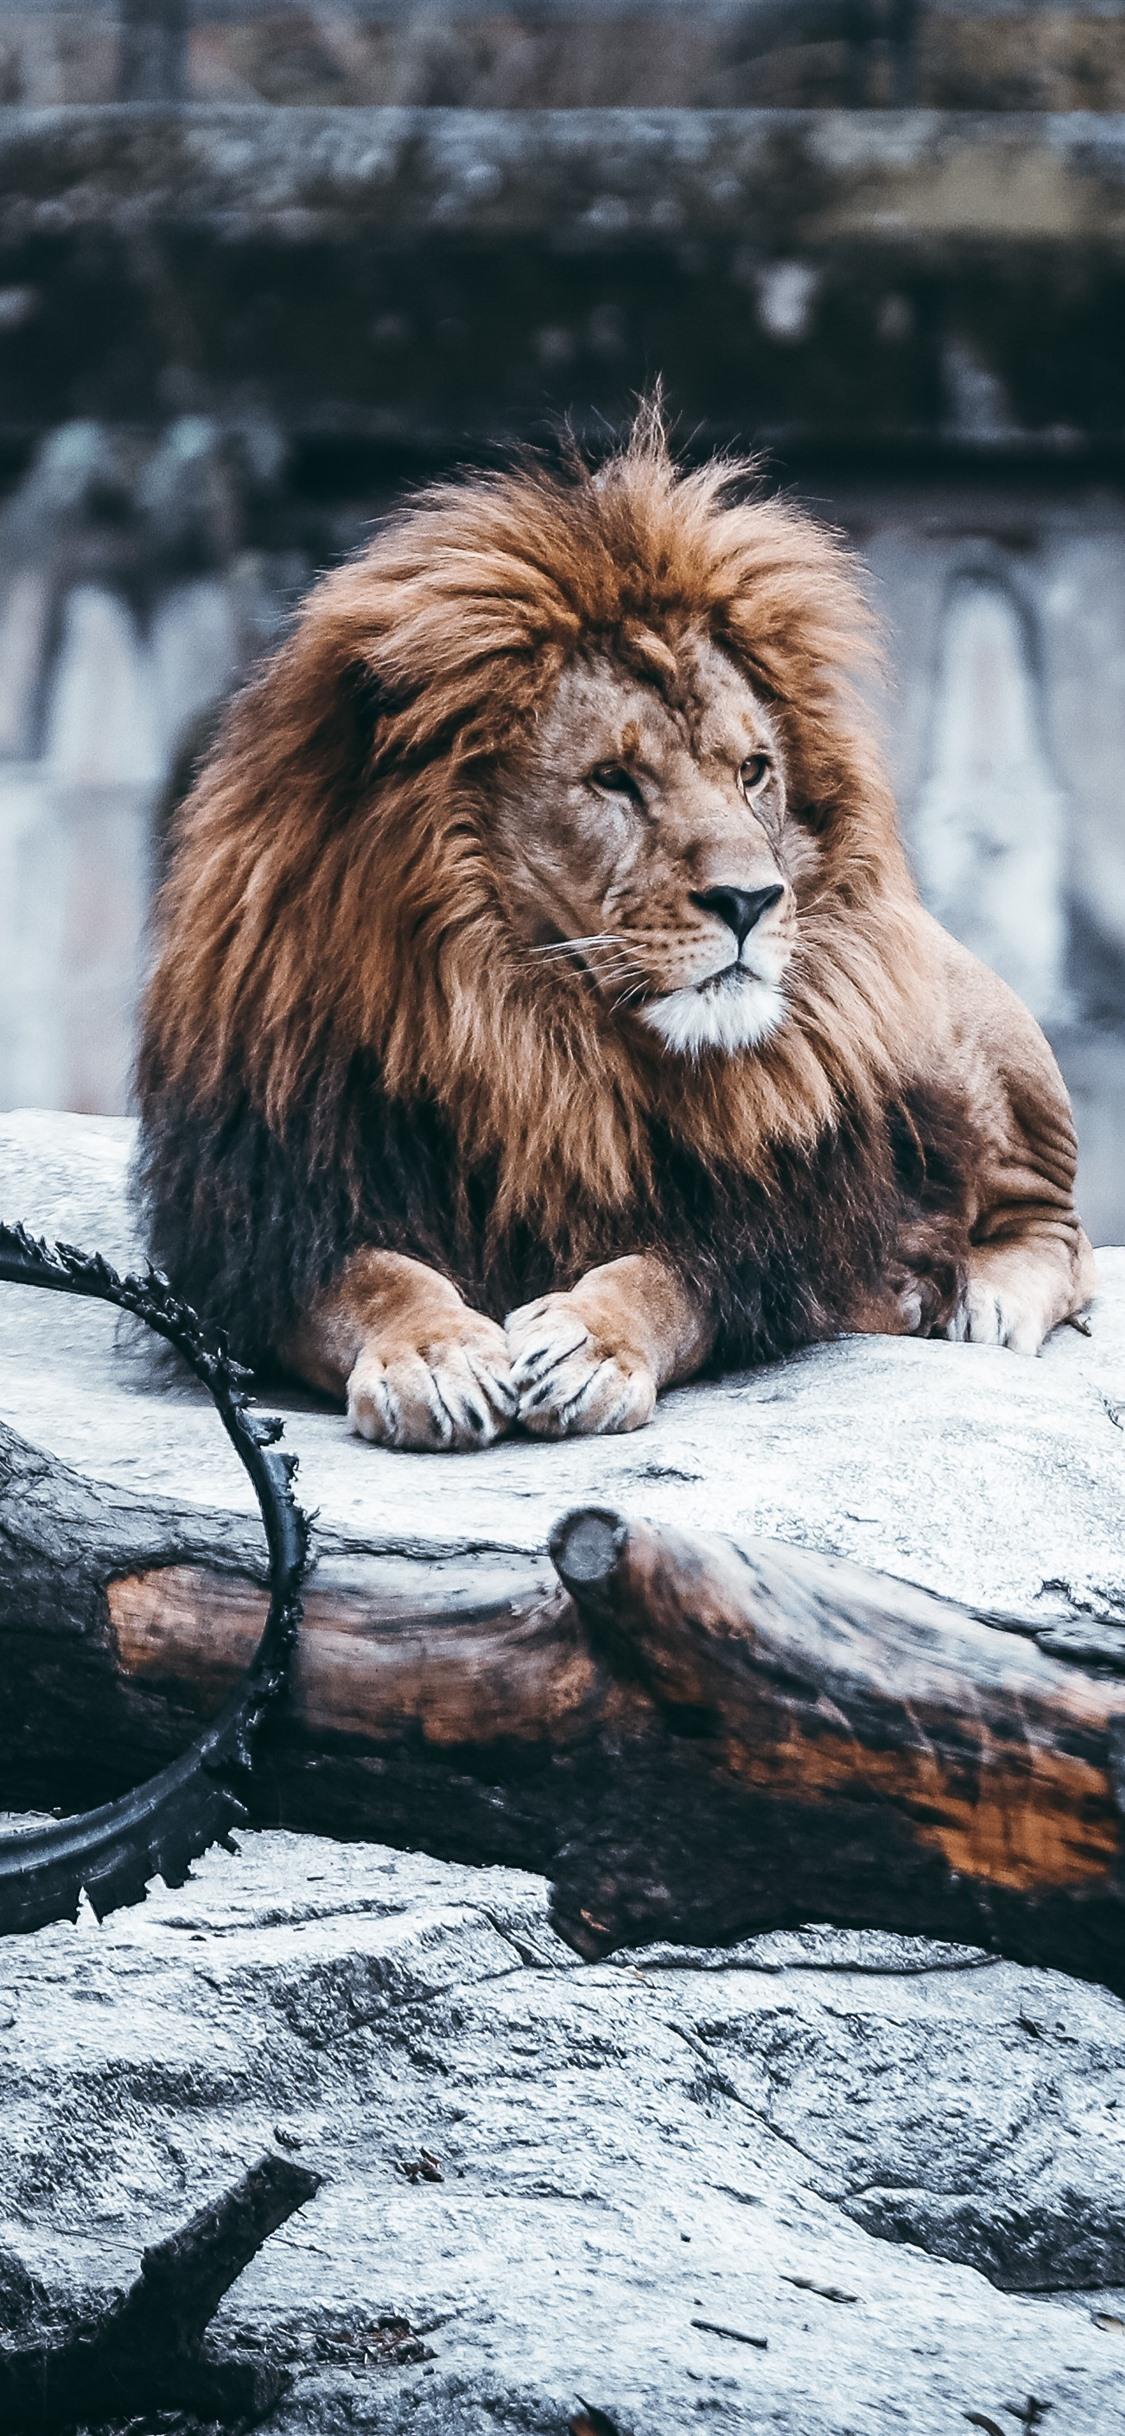 Lion Mane Rocks Wheel Zoo 1242x2688 Iphone Xs Max